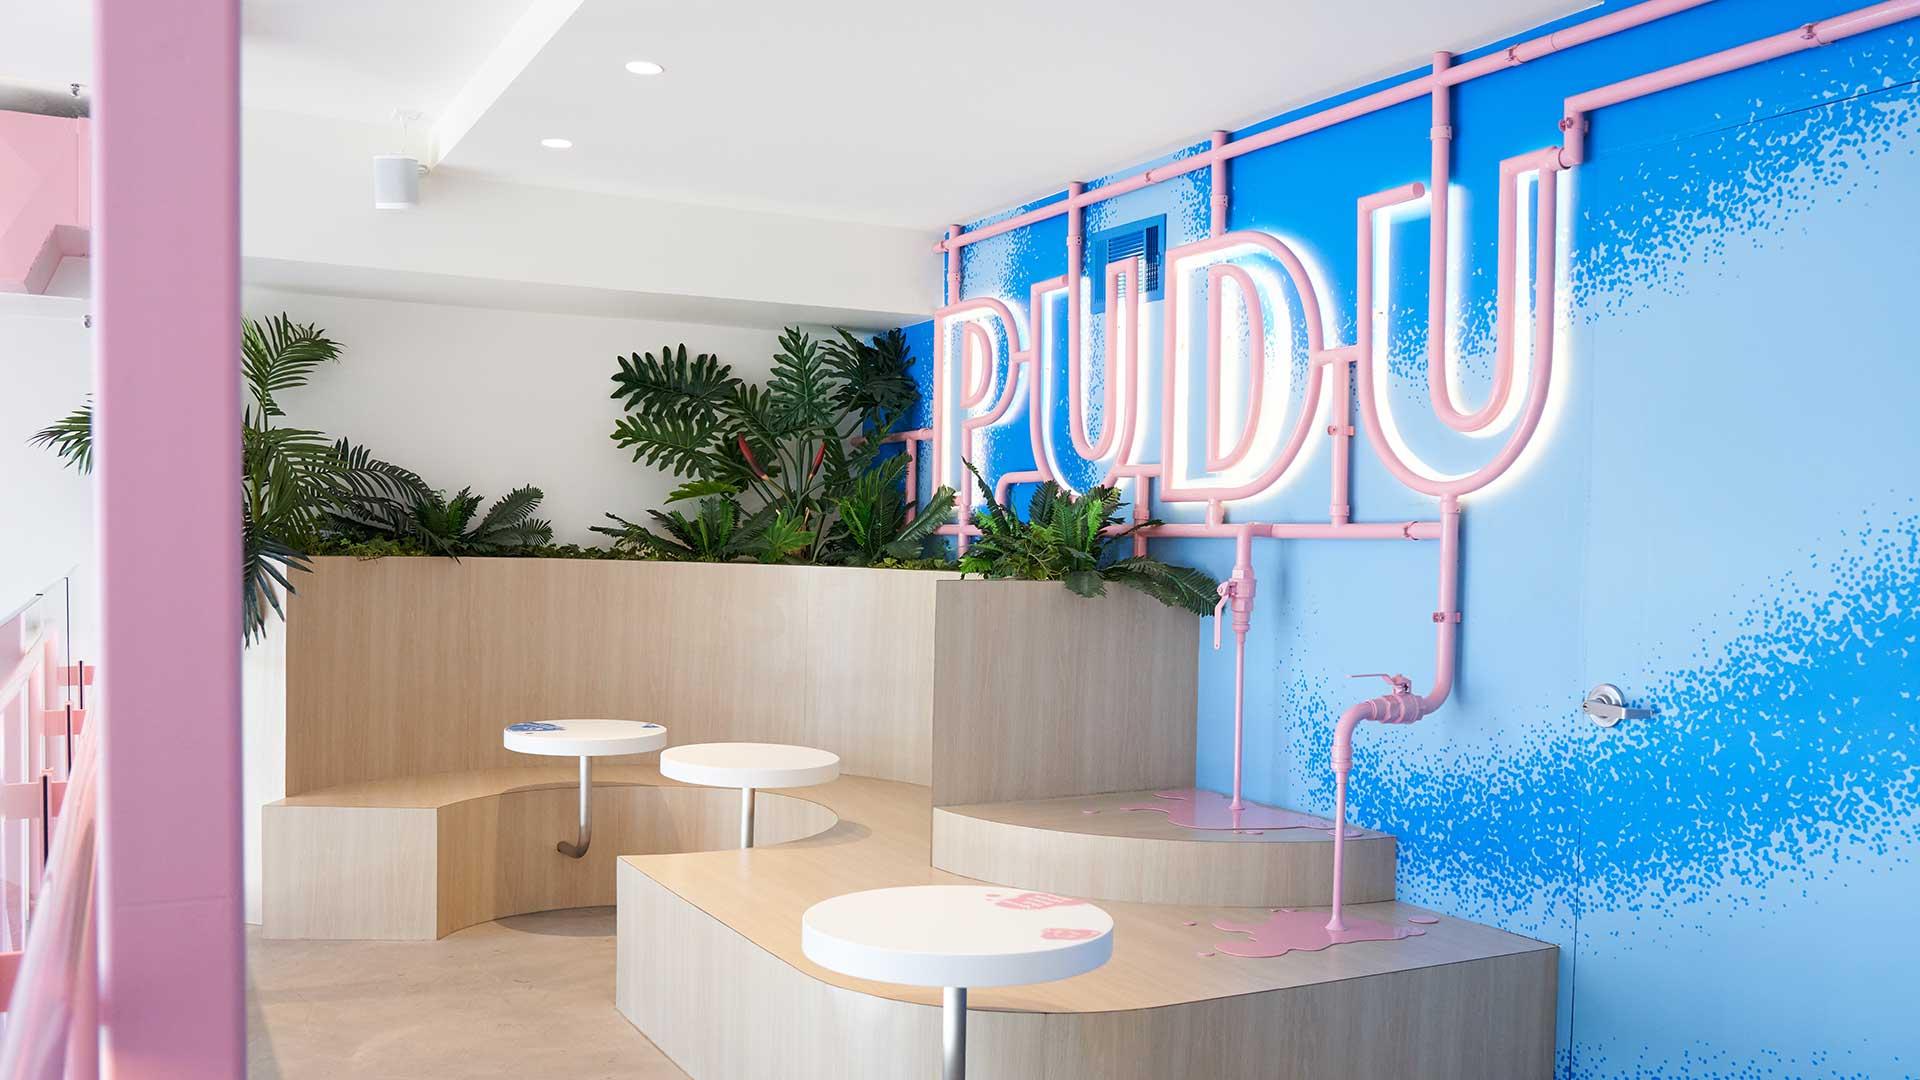 Lighting Design Scheme Pudu Pudu Pudding Store Seating Illuminated Brand Signage Venice California Consultants Nulty